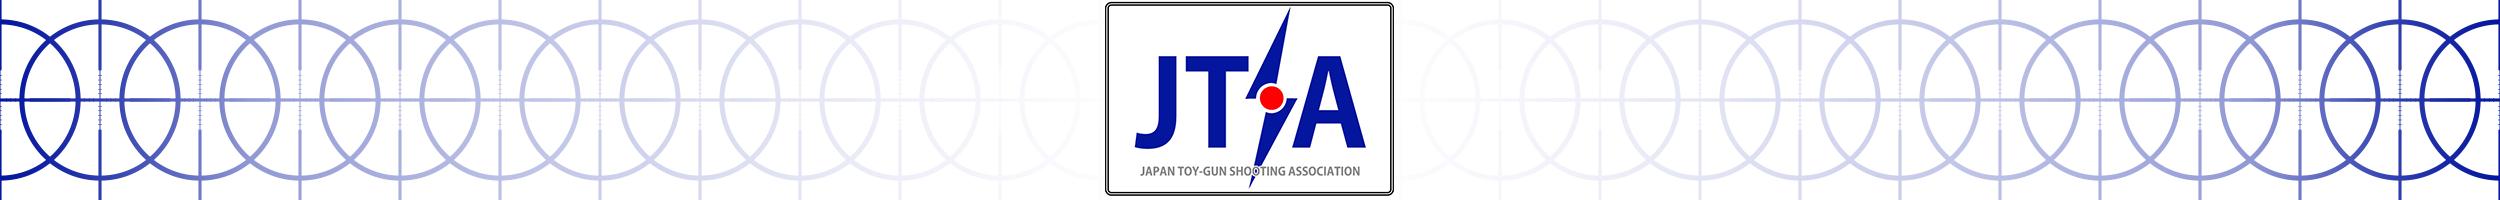 一般社団法人日本トイガン射撃協会 JTSA